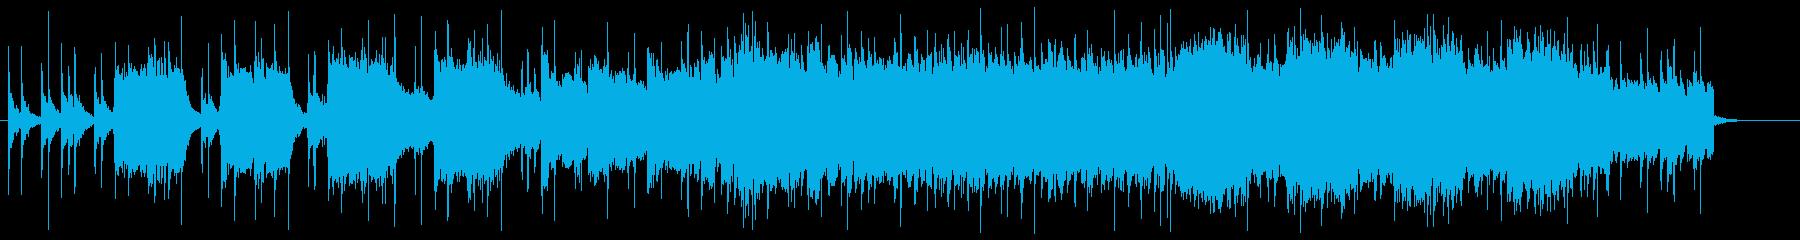 CM向けロックアンセム タンバリン無版の再生済みの波形